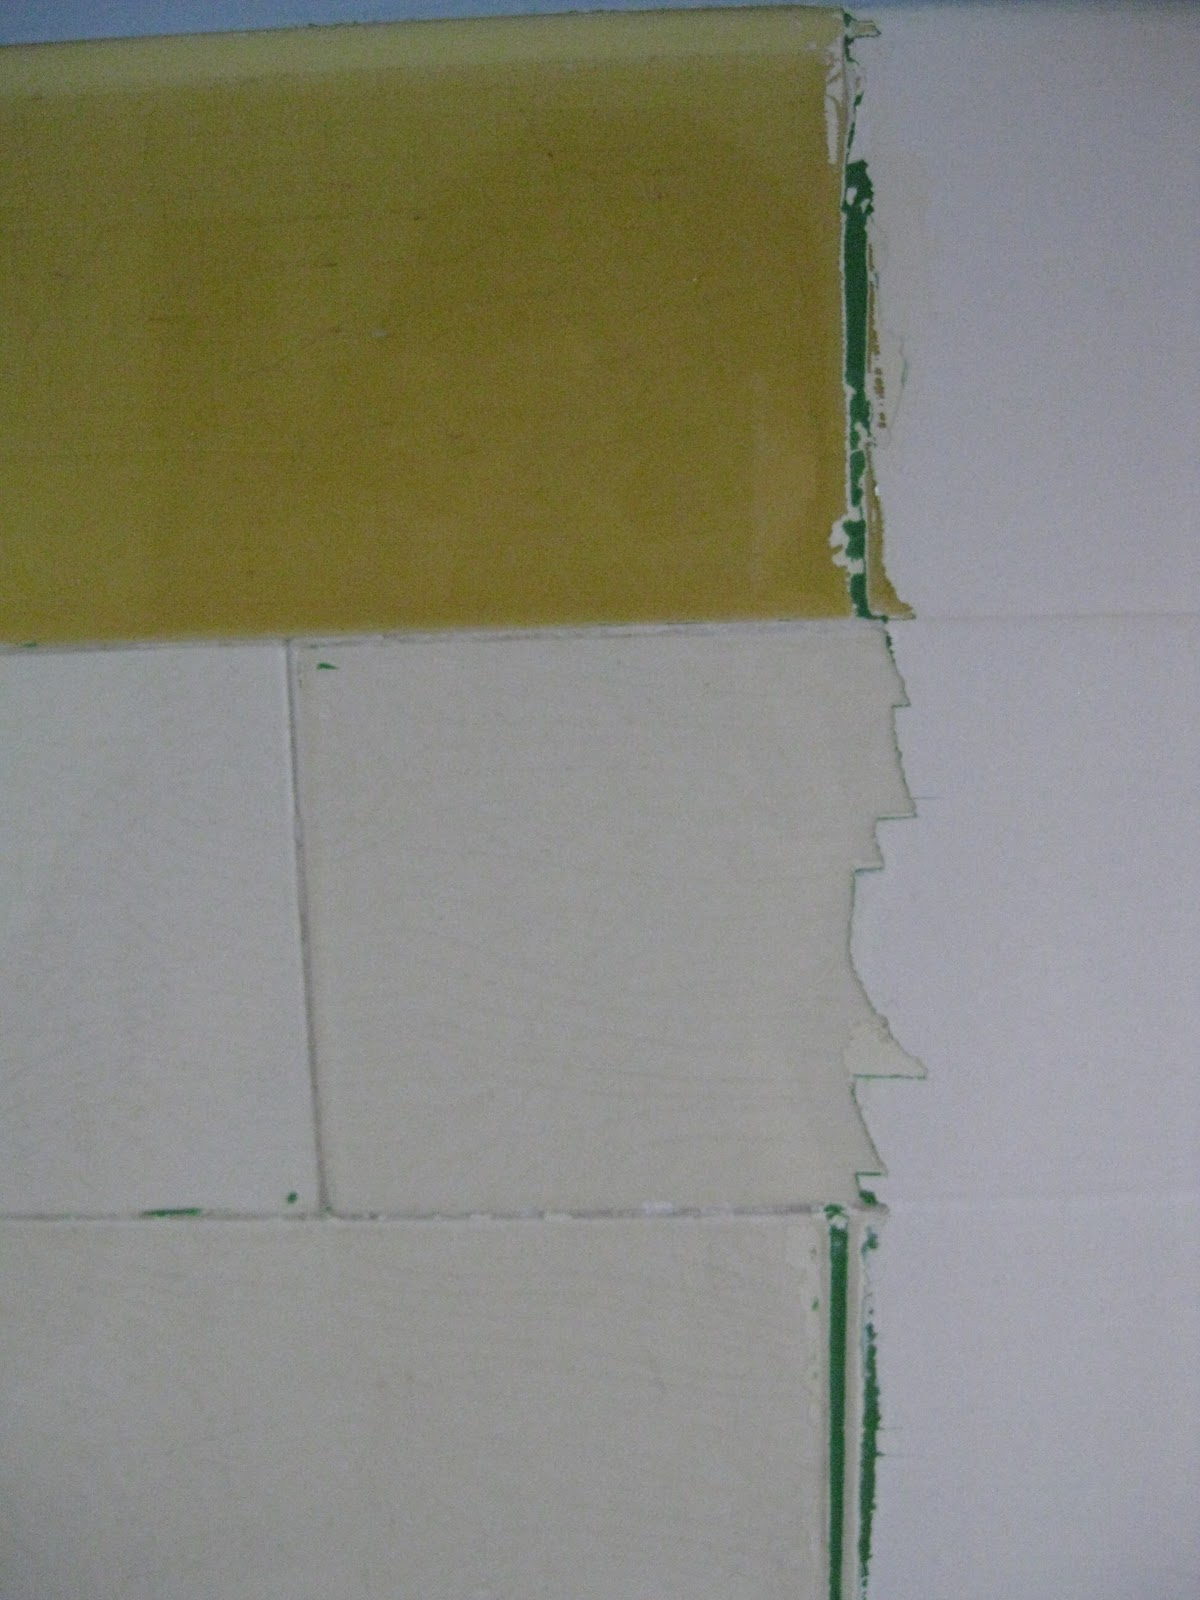 http://4.bp.blogspot.com/-Br44ONXQ_wA/TZHTwyz7PHI/AAAAAAAAAmk/MMB-3nFnUs4/s1600/80+years+woth+of+paint+and+tiles%255B1%255D.JPG